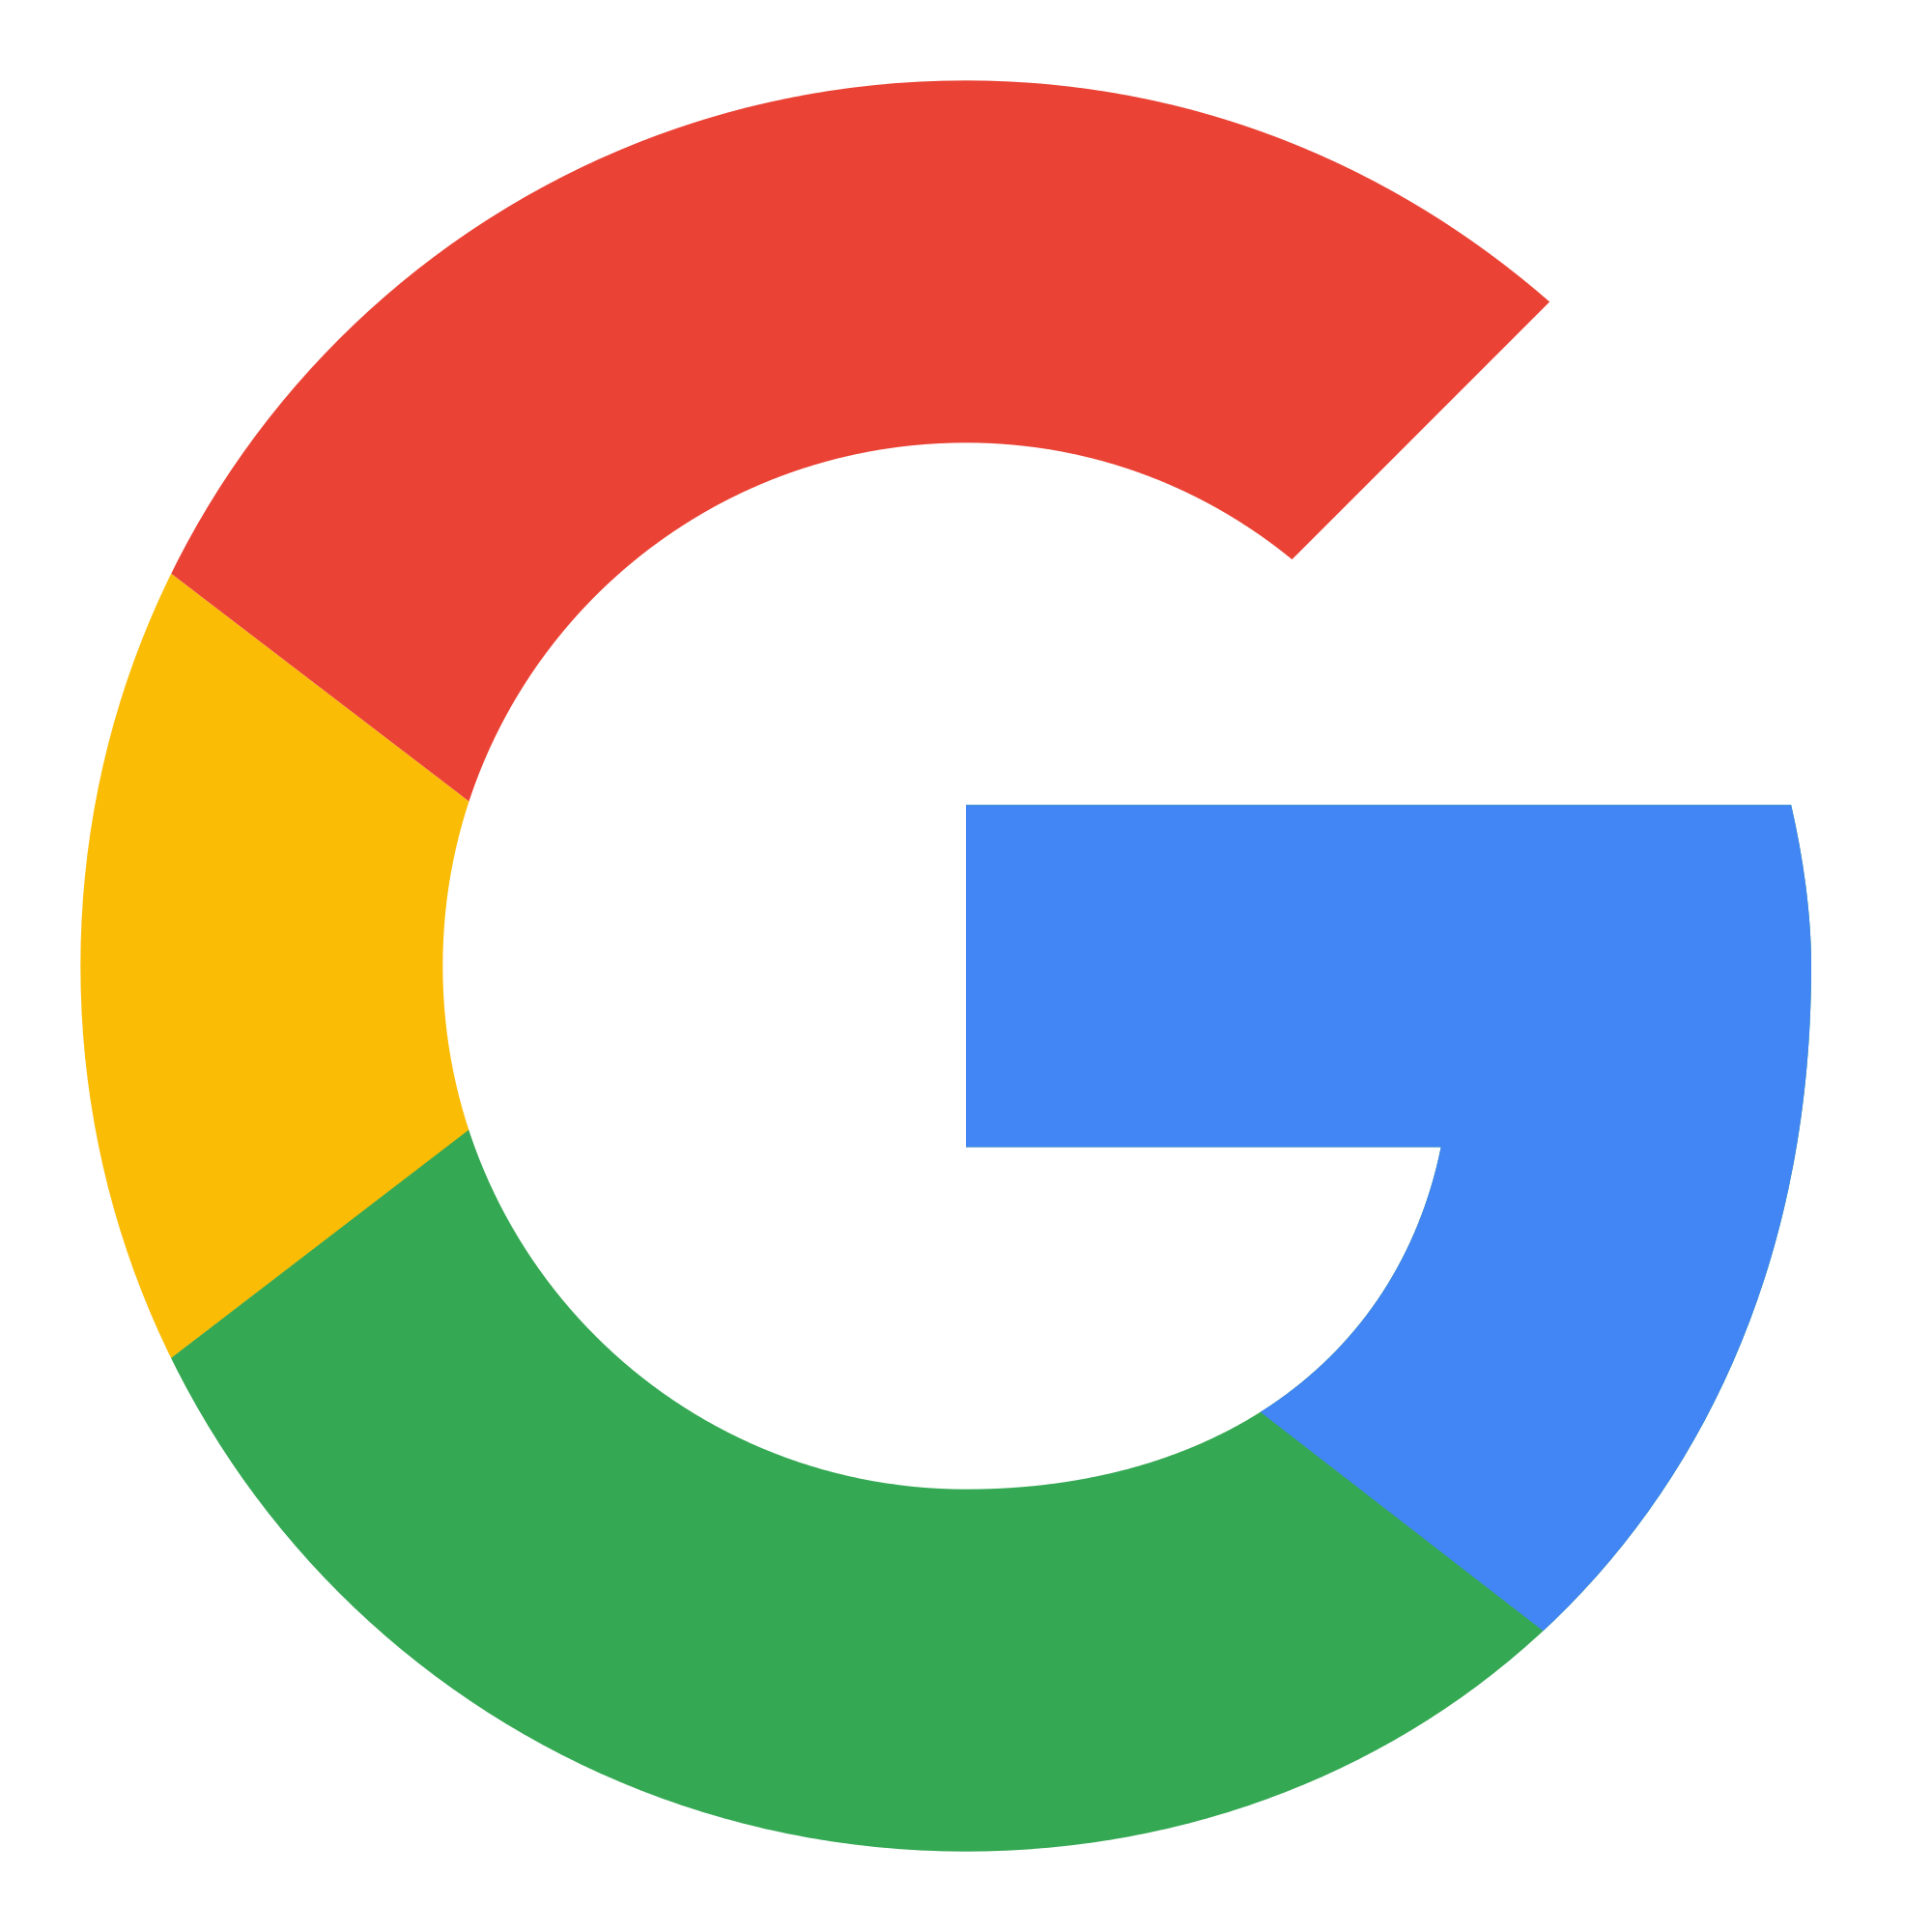 Google doodles an artistic. Number 1 clipart rank